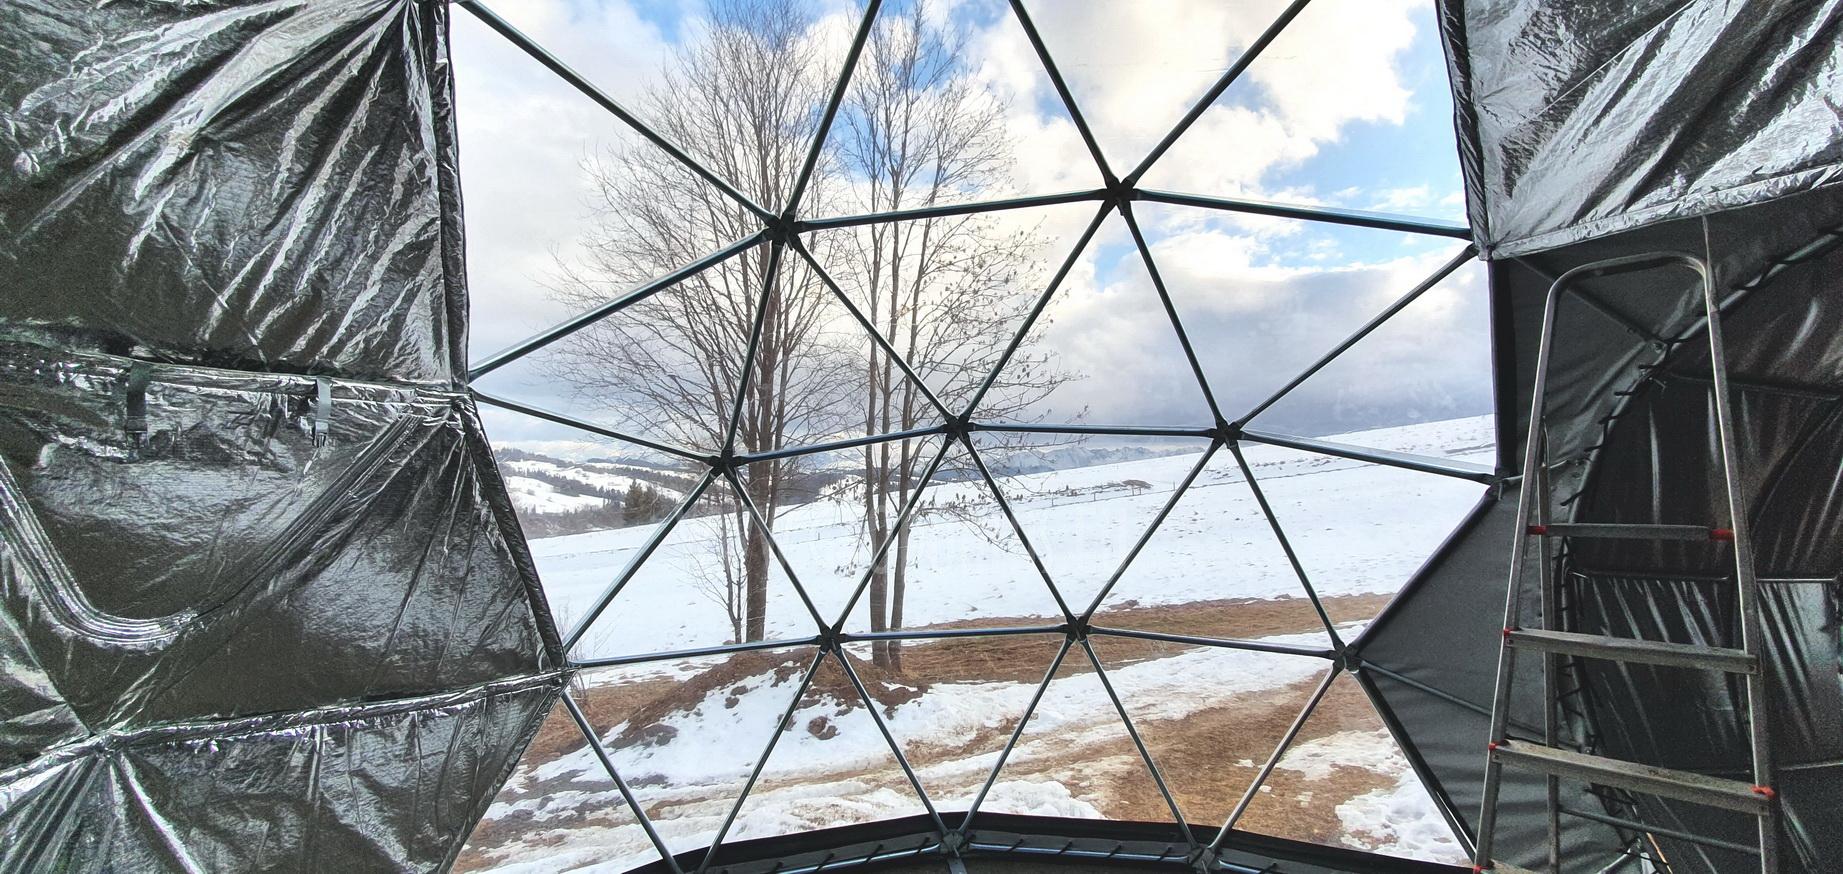 35m² + 20m² Glamping SPA Domes Ø6,7m ir Ø5m | Zakopane, Poland